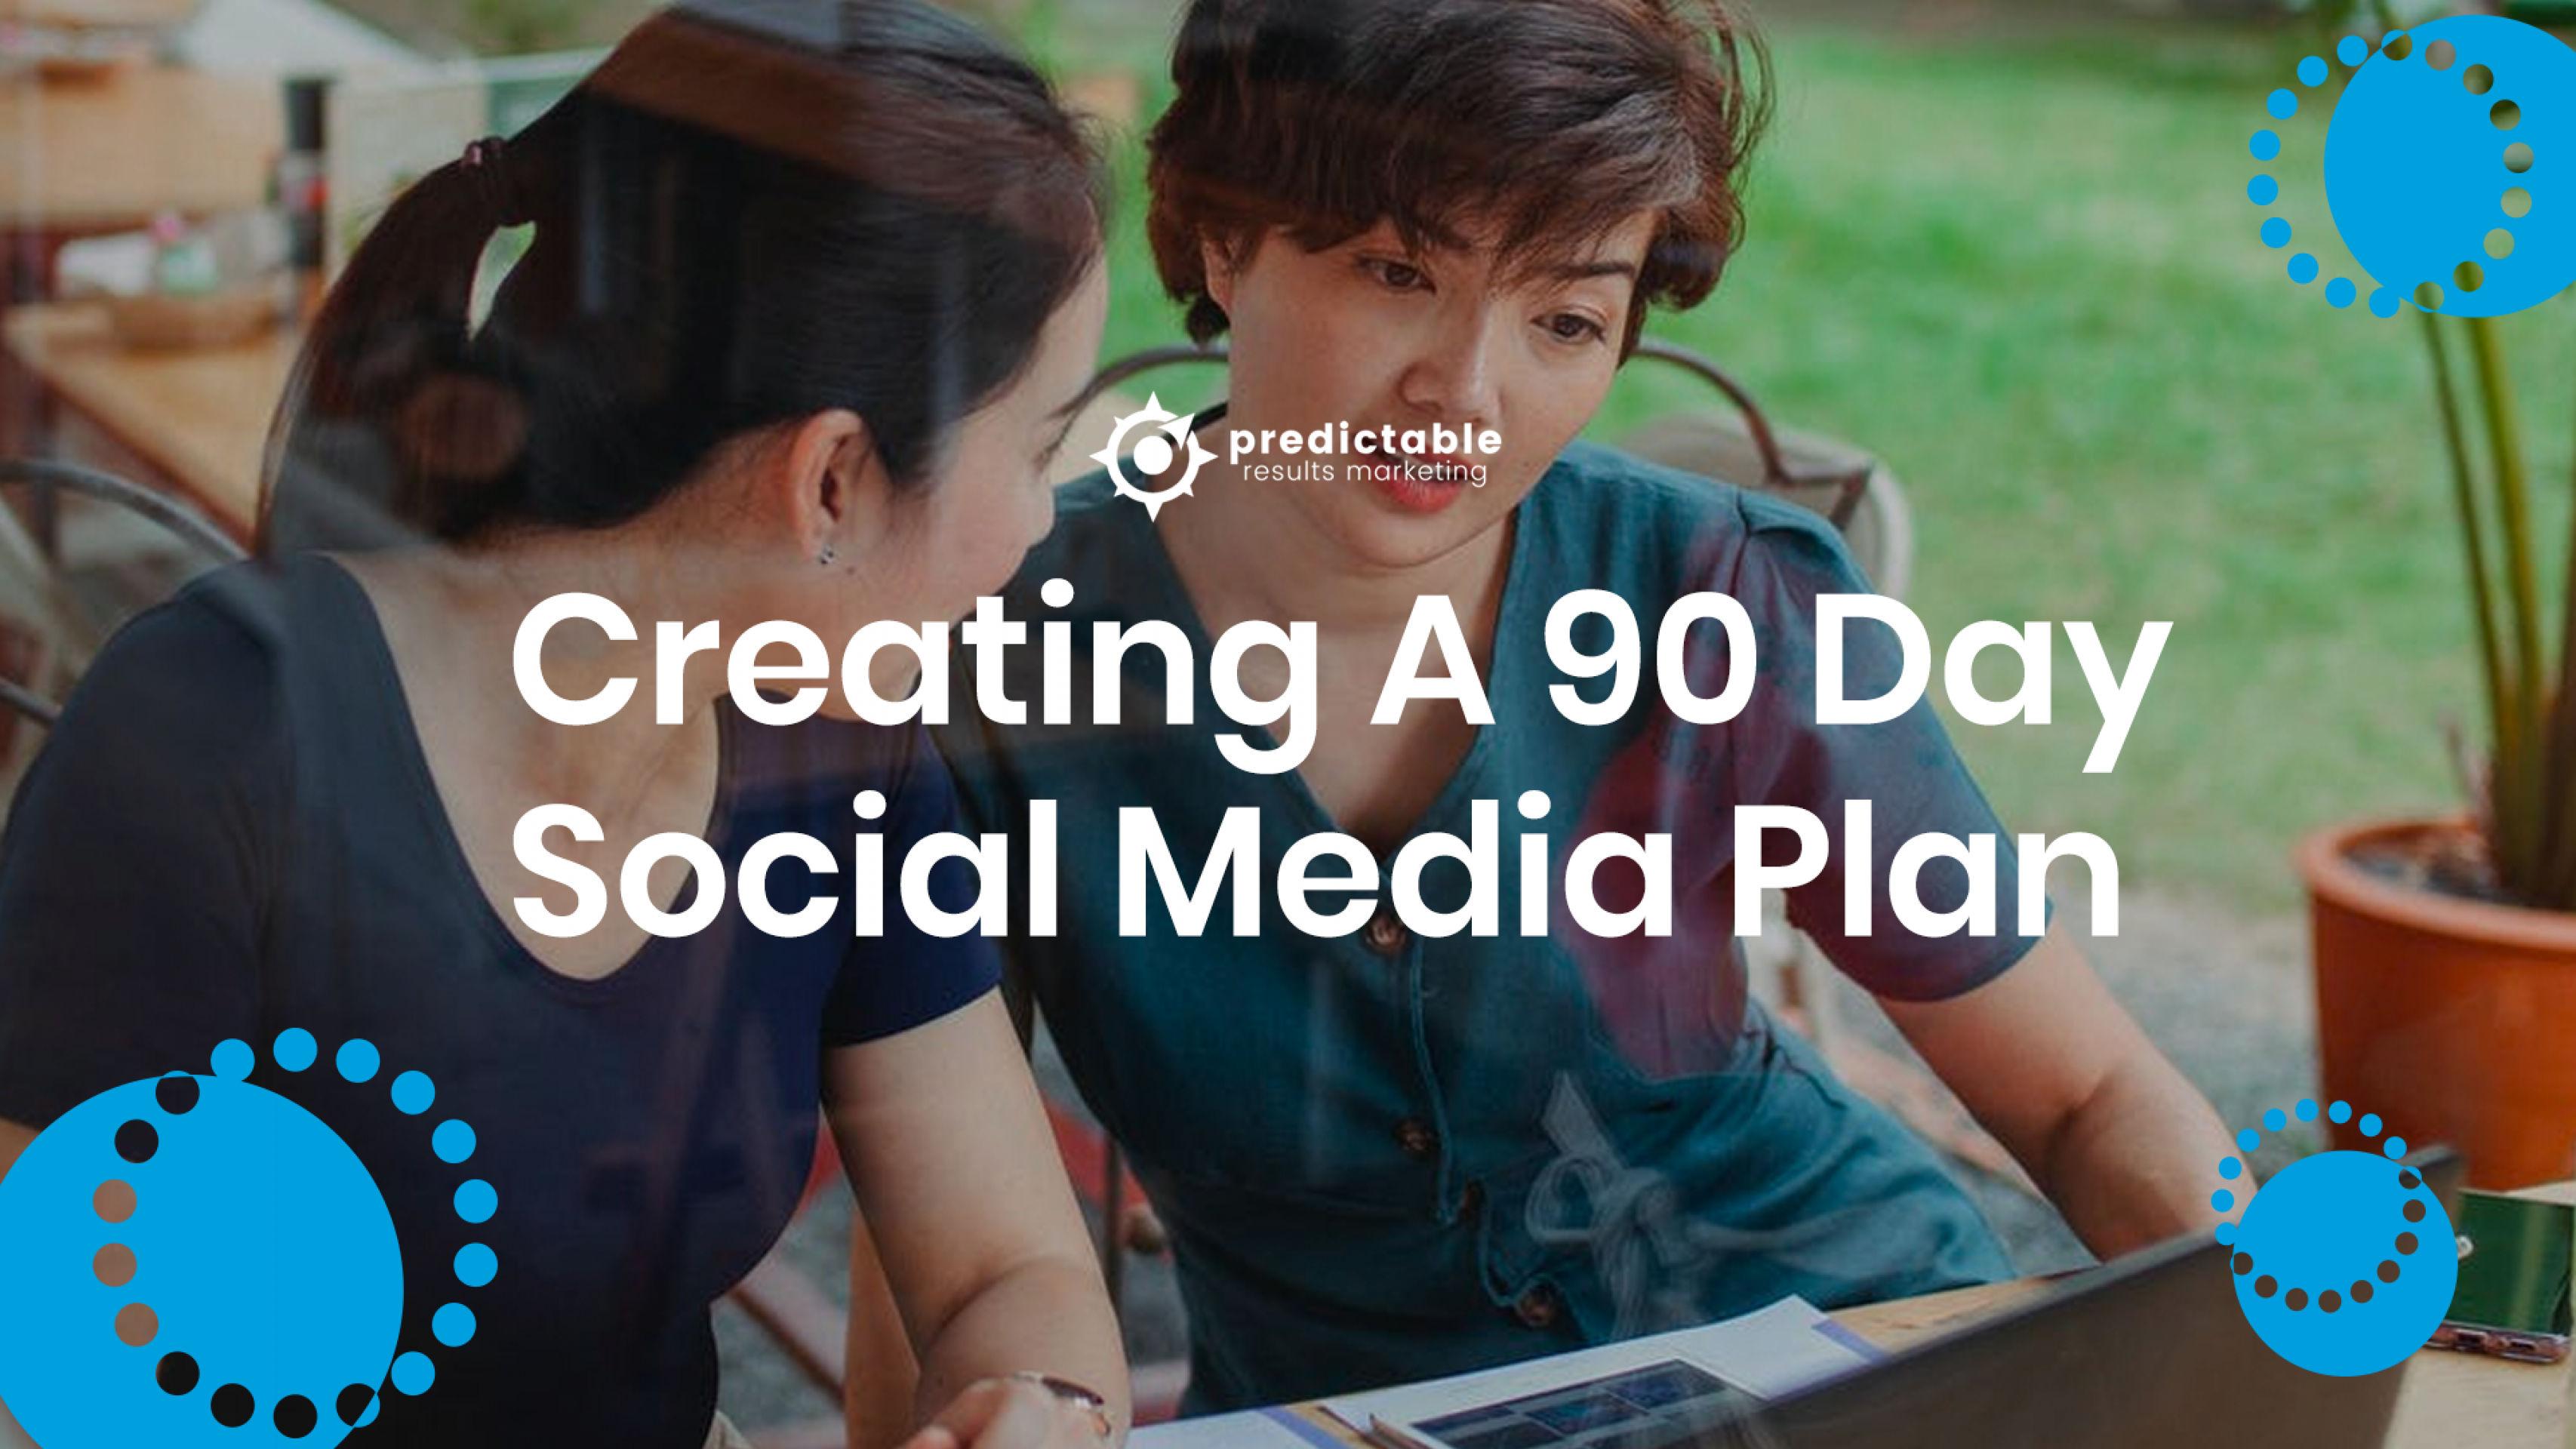 Creating a 90 Day Social Media Plan